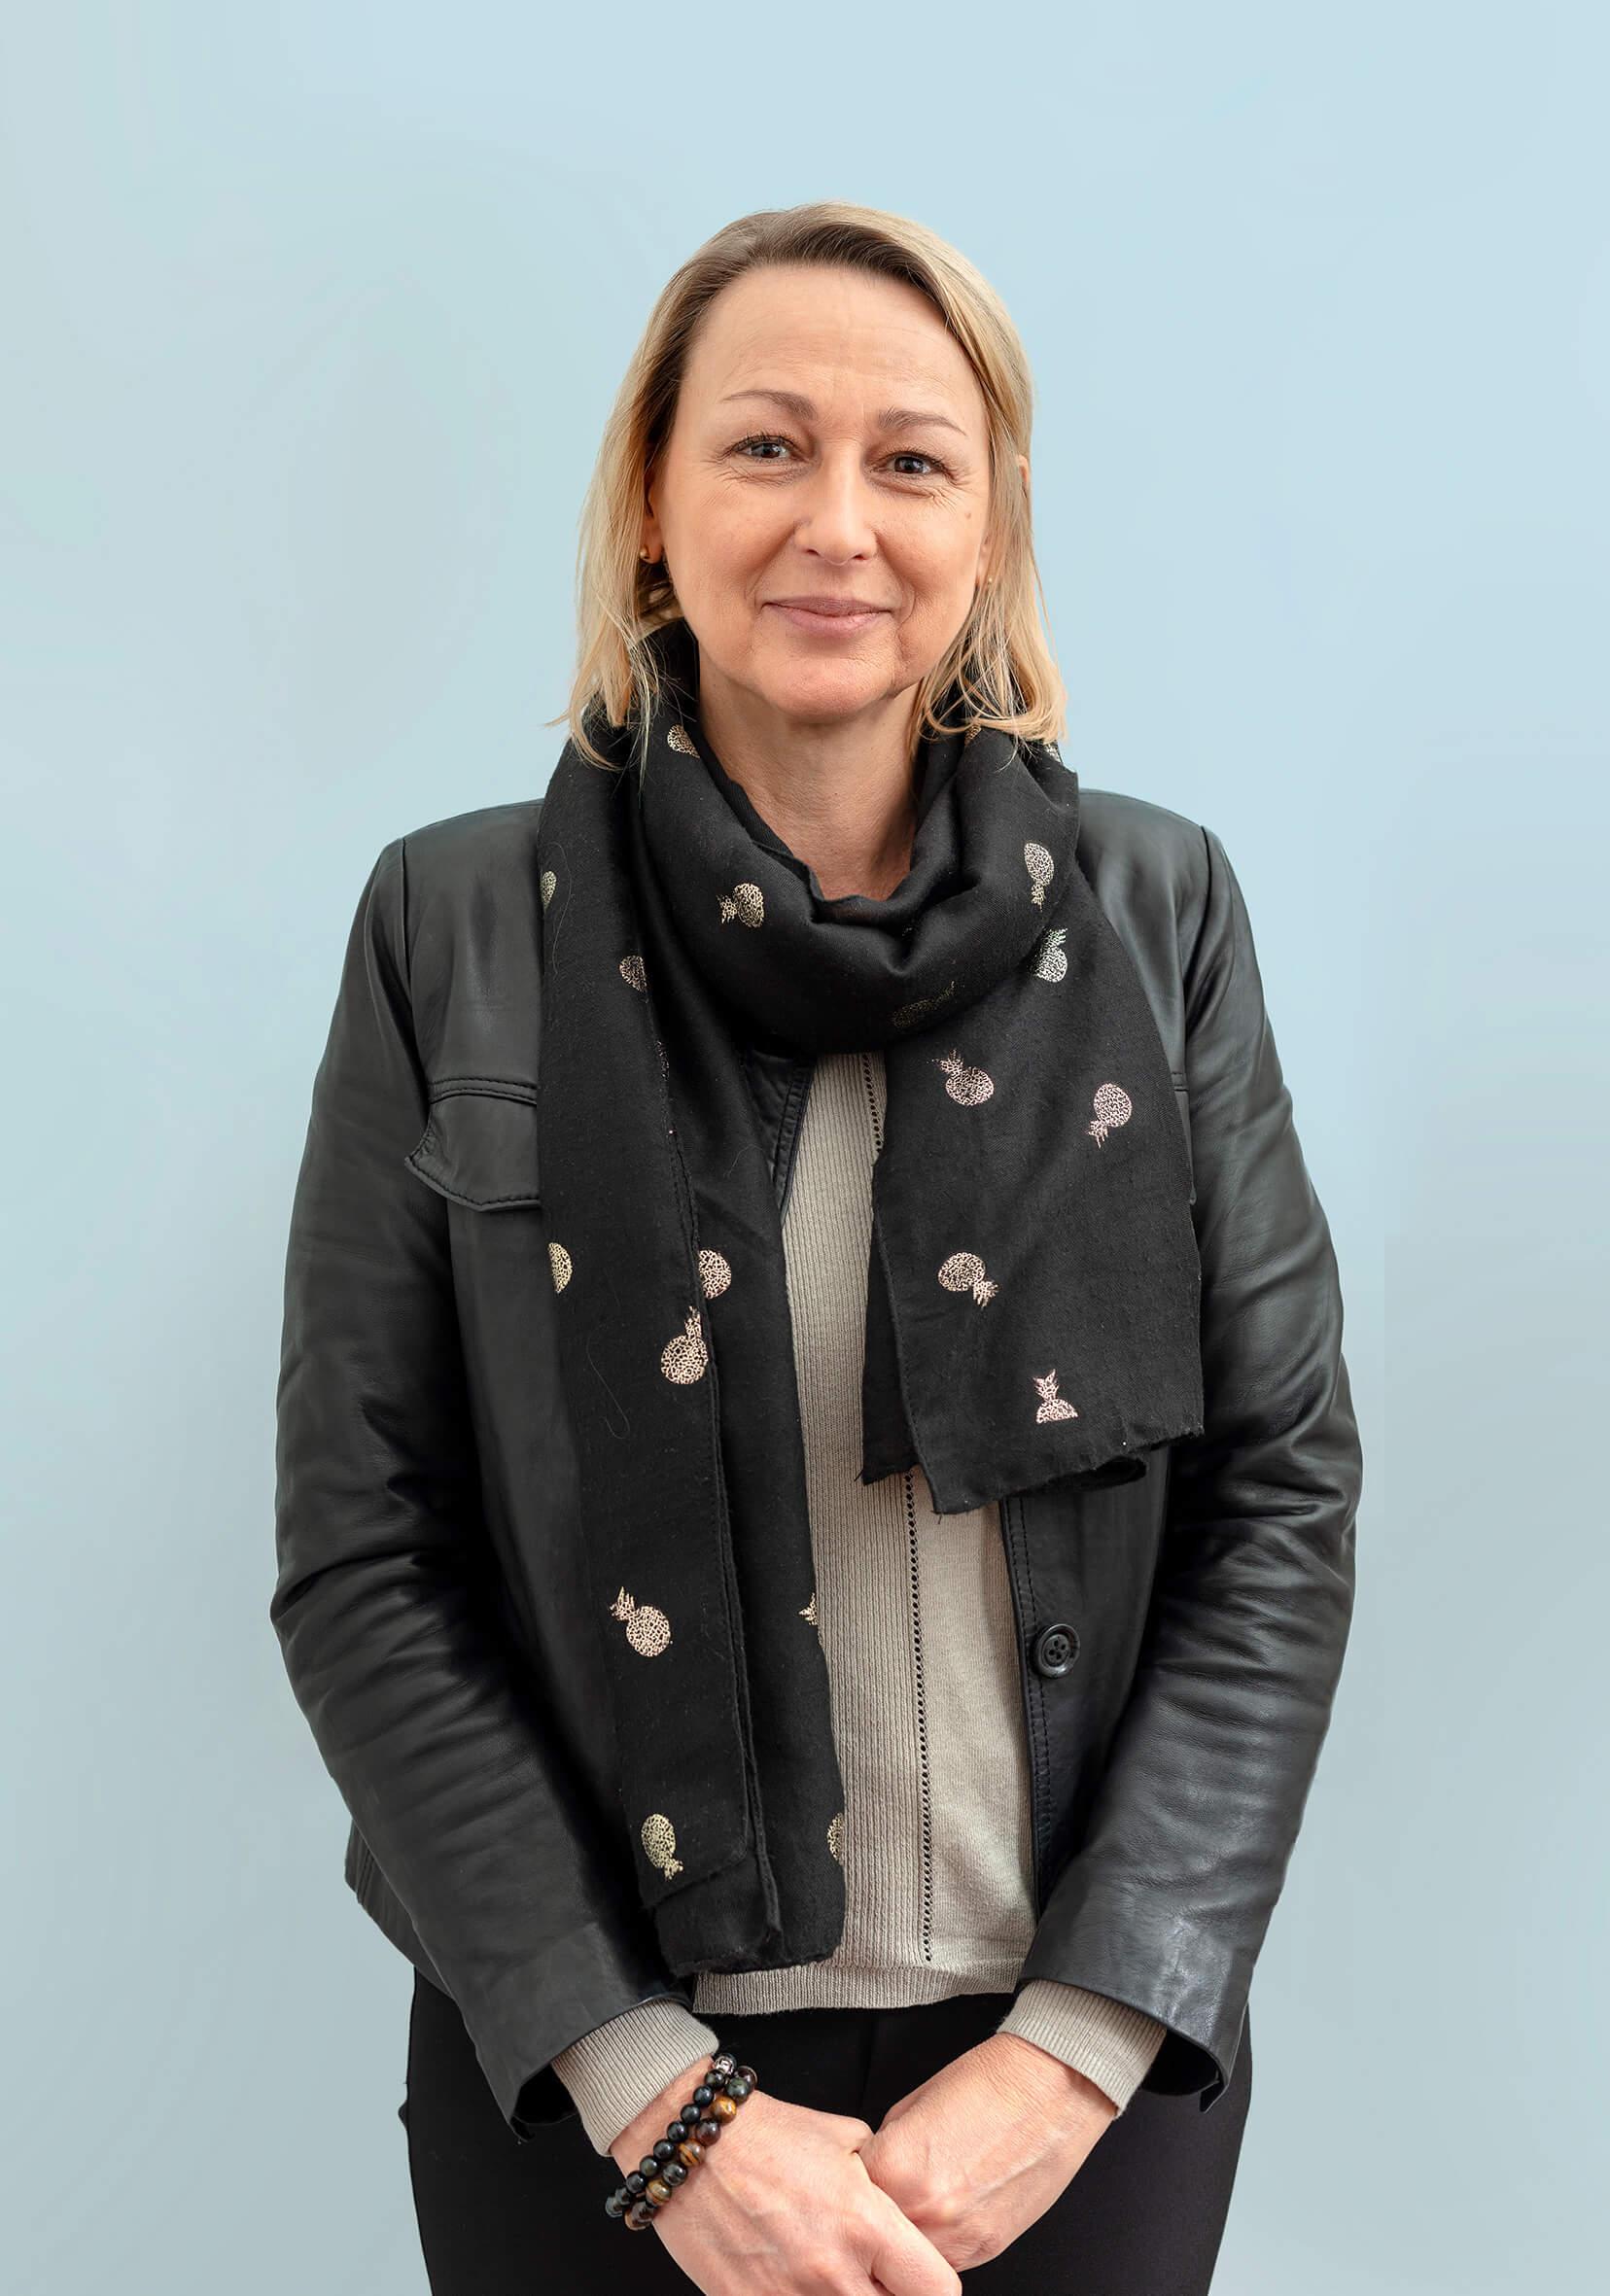 Nathalie Talbot